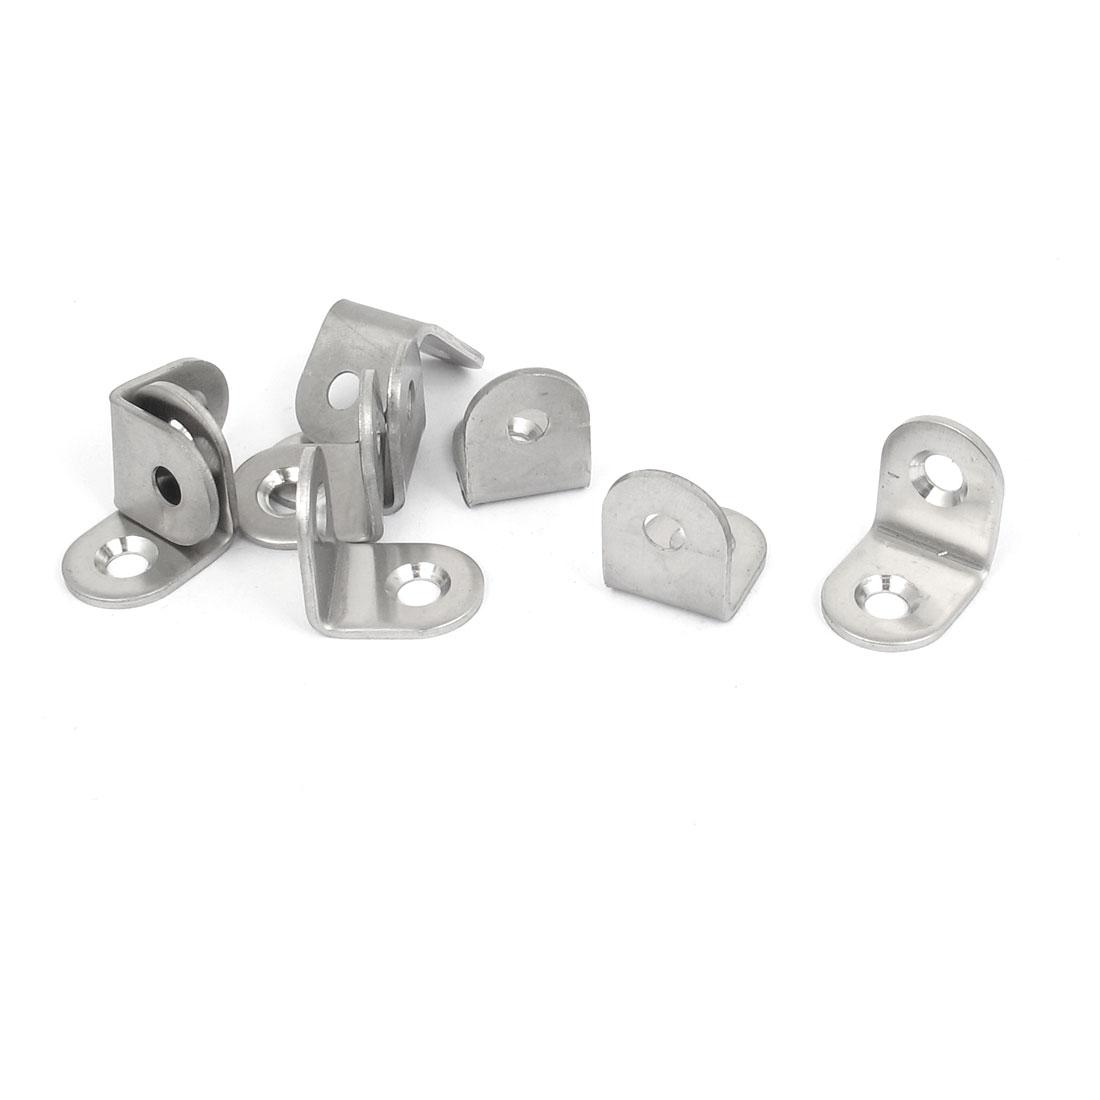 20mmx20mm L Shape 90 Degree Shelf Corner Brace Angle Bracket Support 9pcs